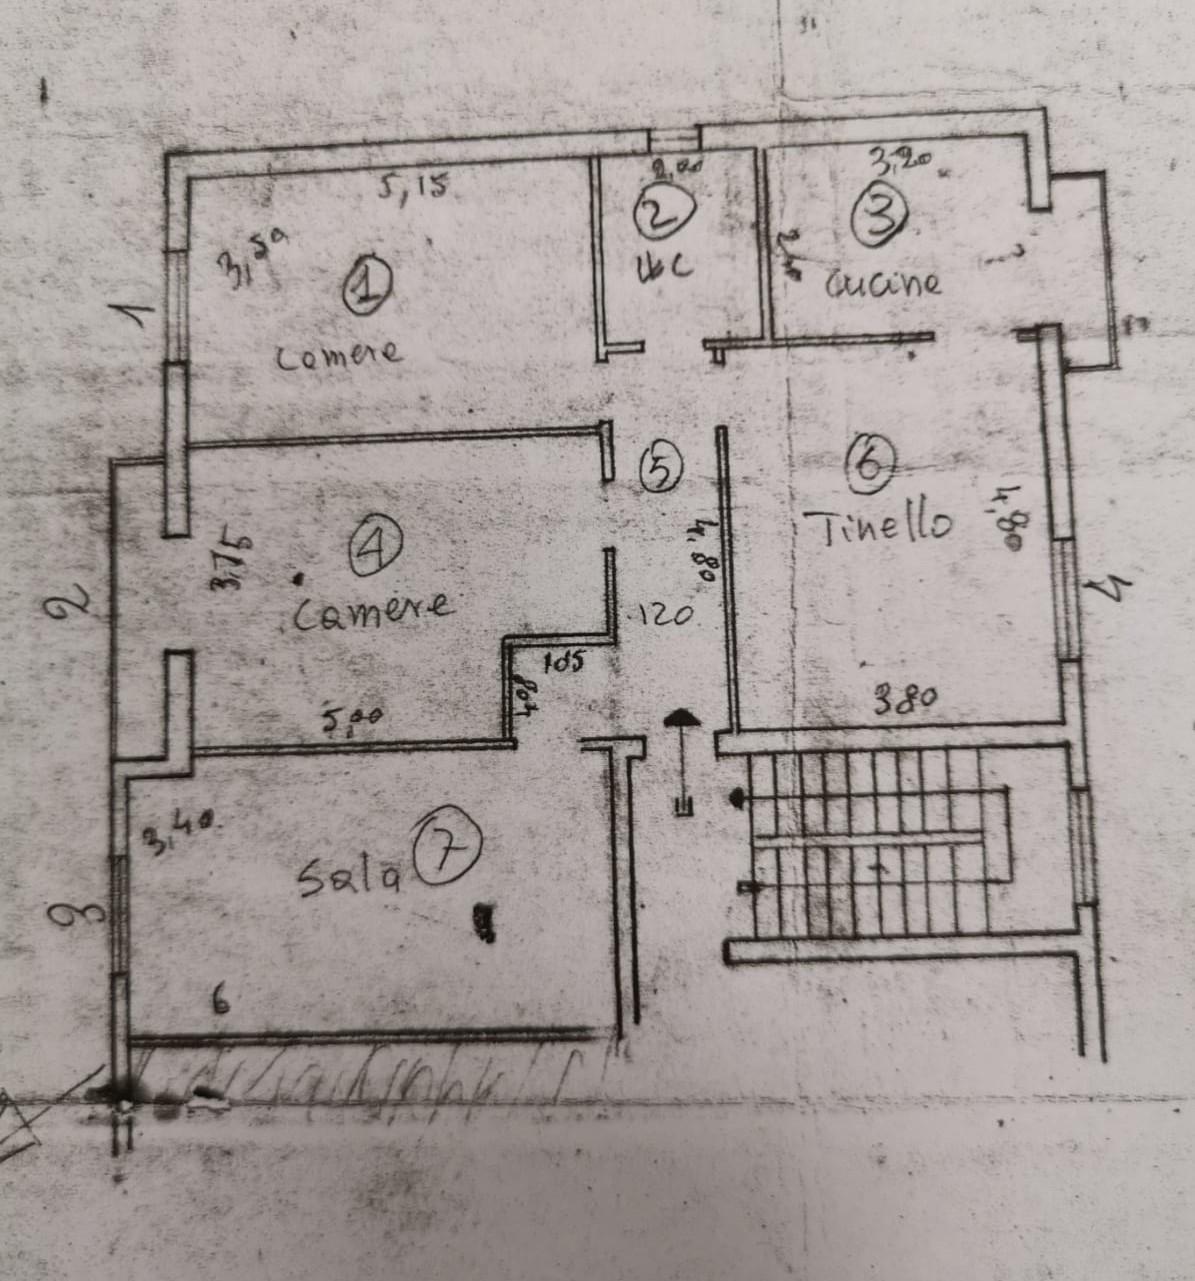 Appartamento in vendita, rif. LRA31 (Planimetria 1/1)